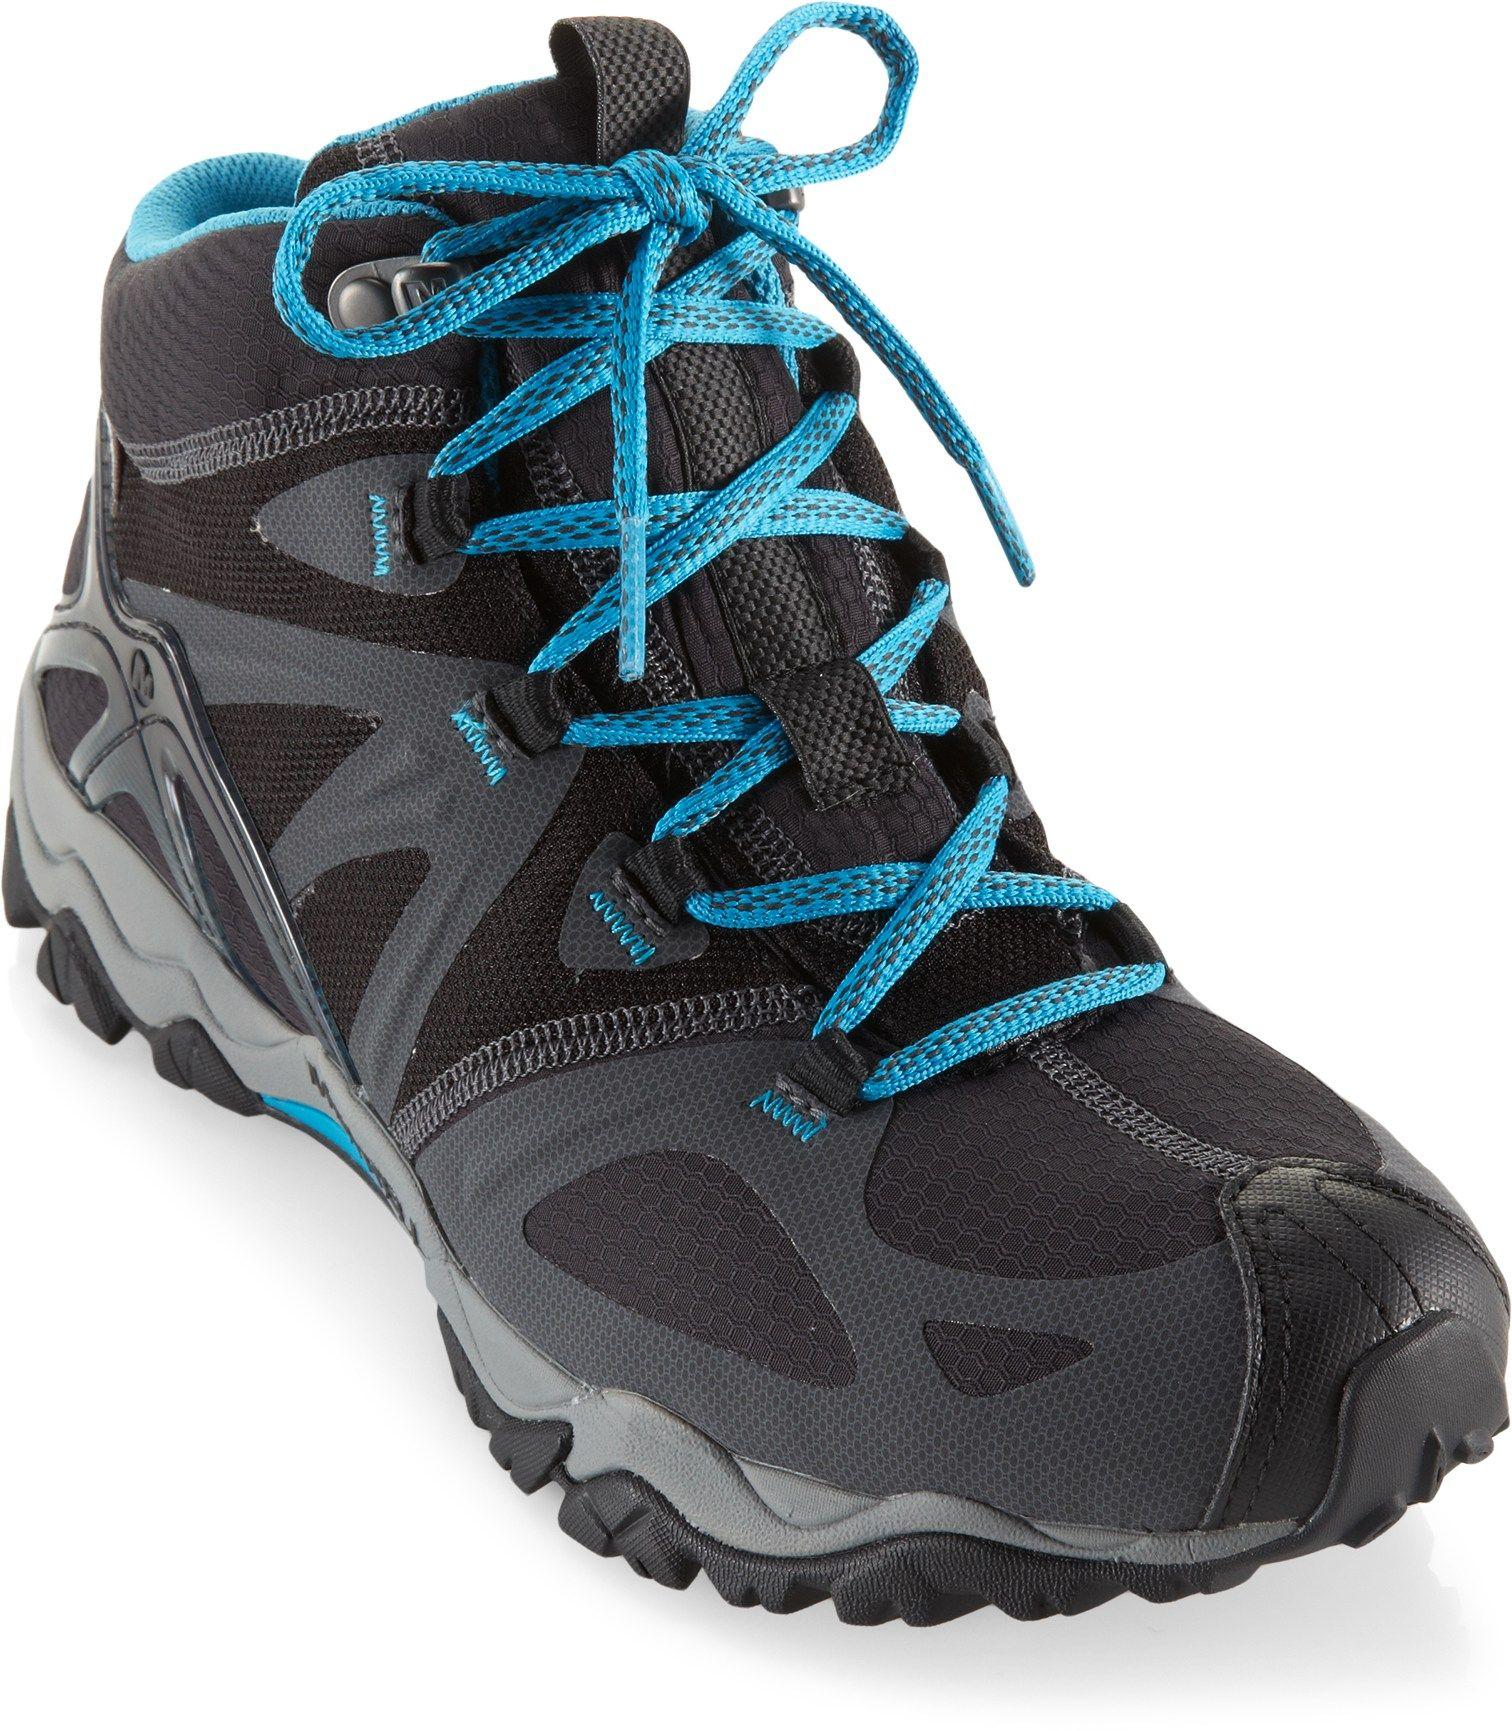 Vegan hiking boots, Hiking boots